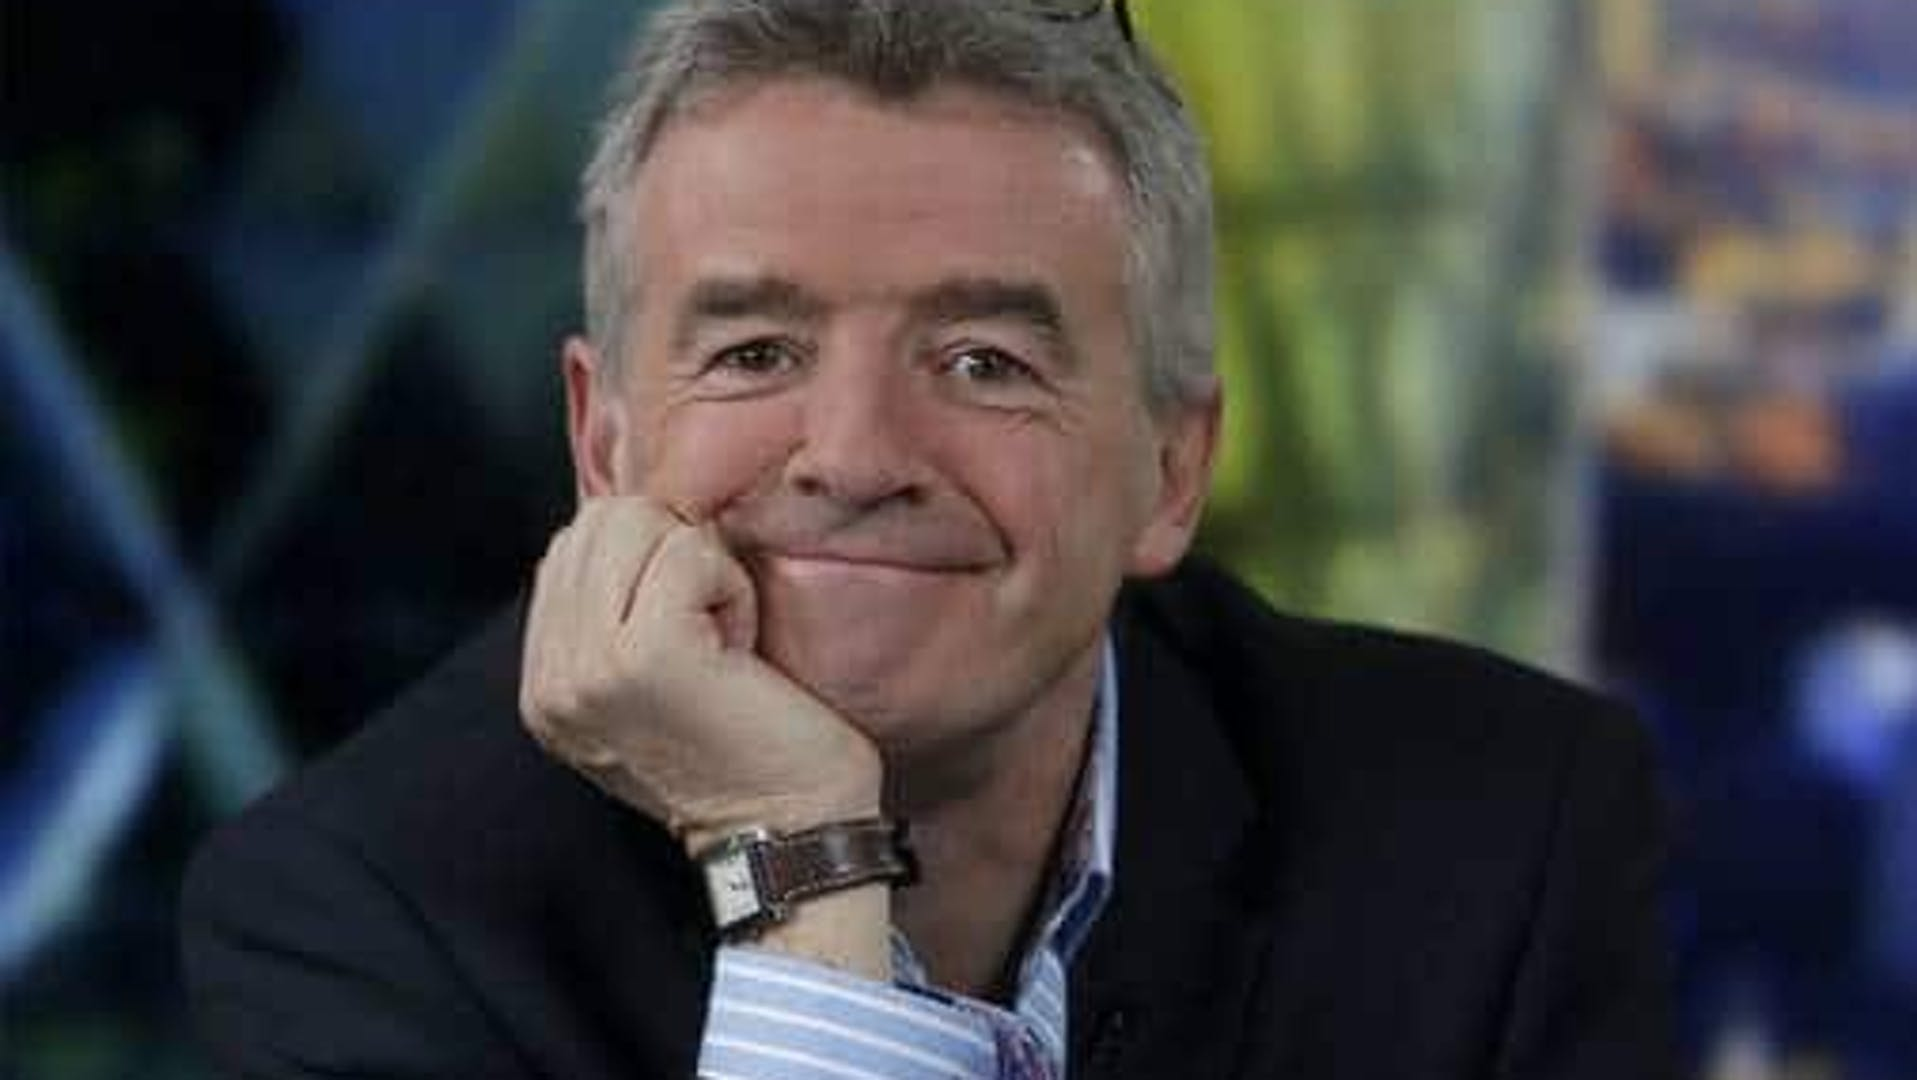 Michael O'Leary of Ryanair